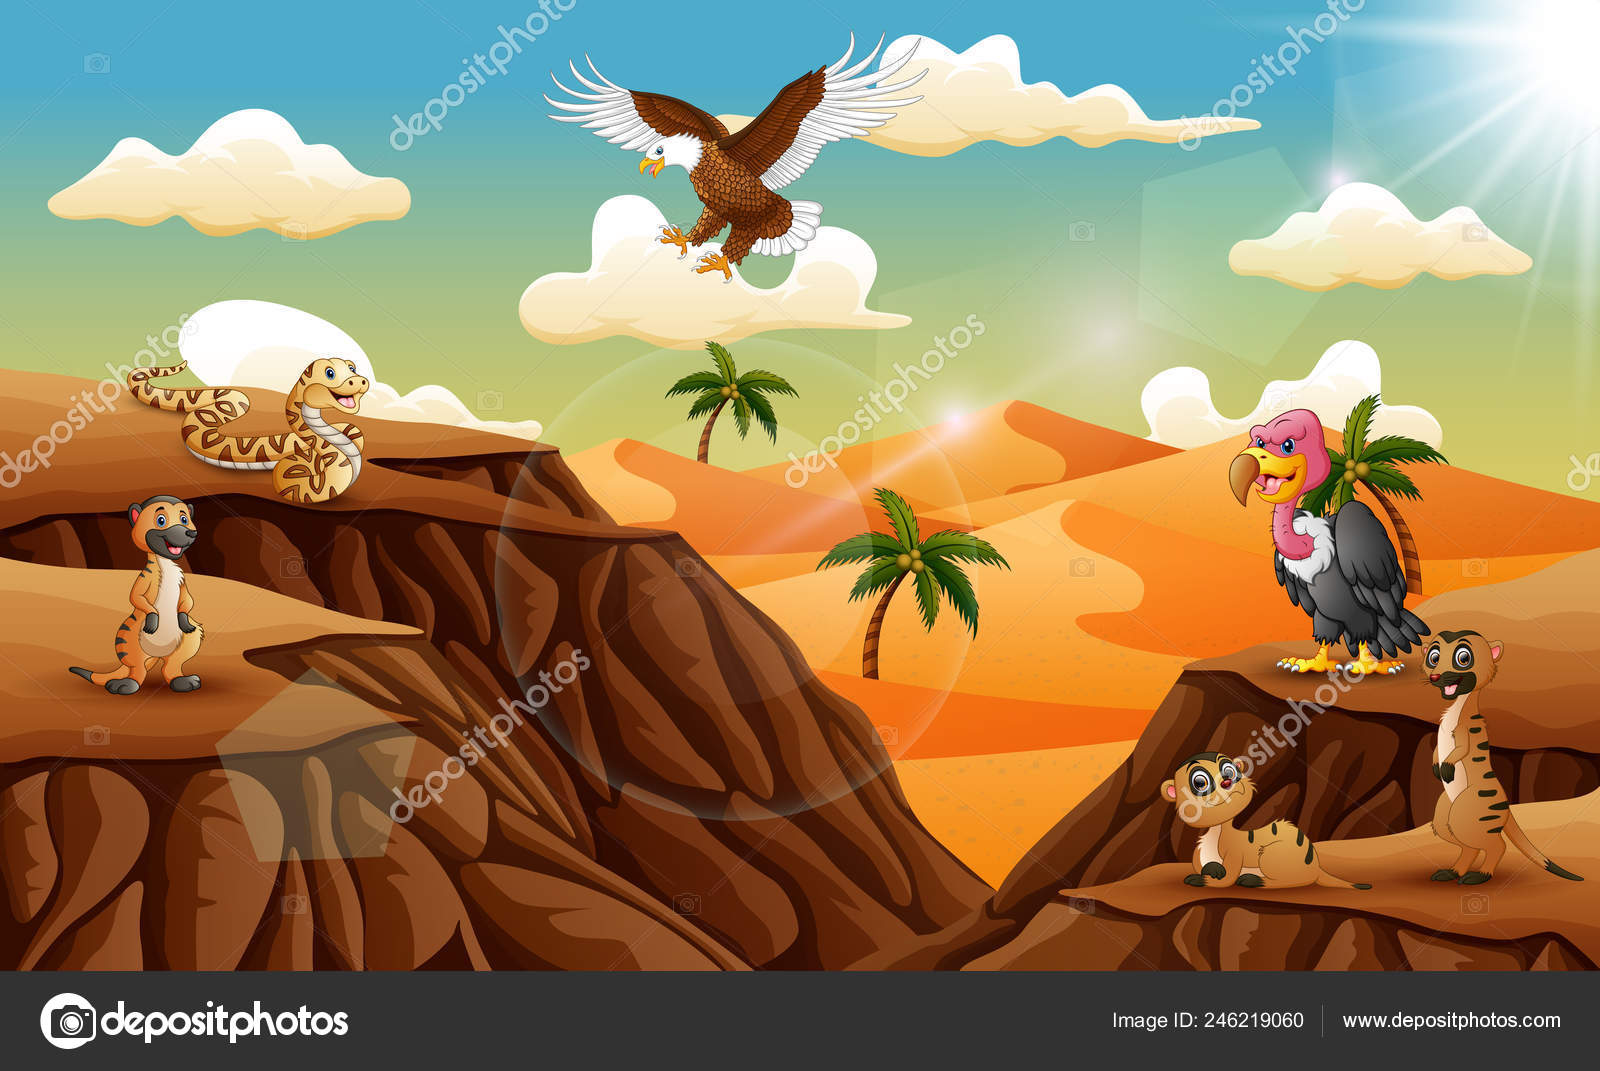 Cartoon Animal Desert Background Stock Vector C Dualoro 246219060